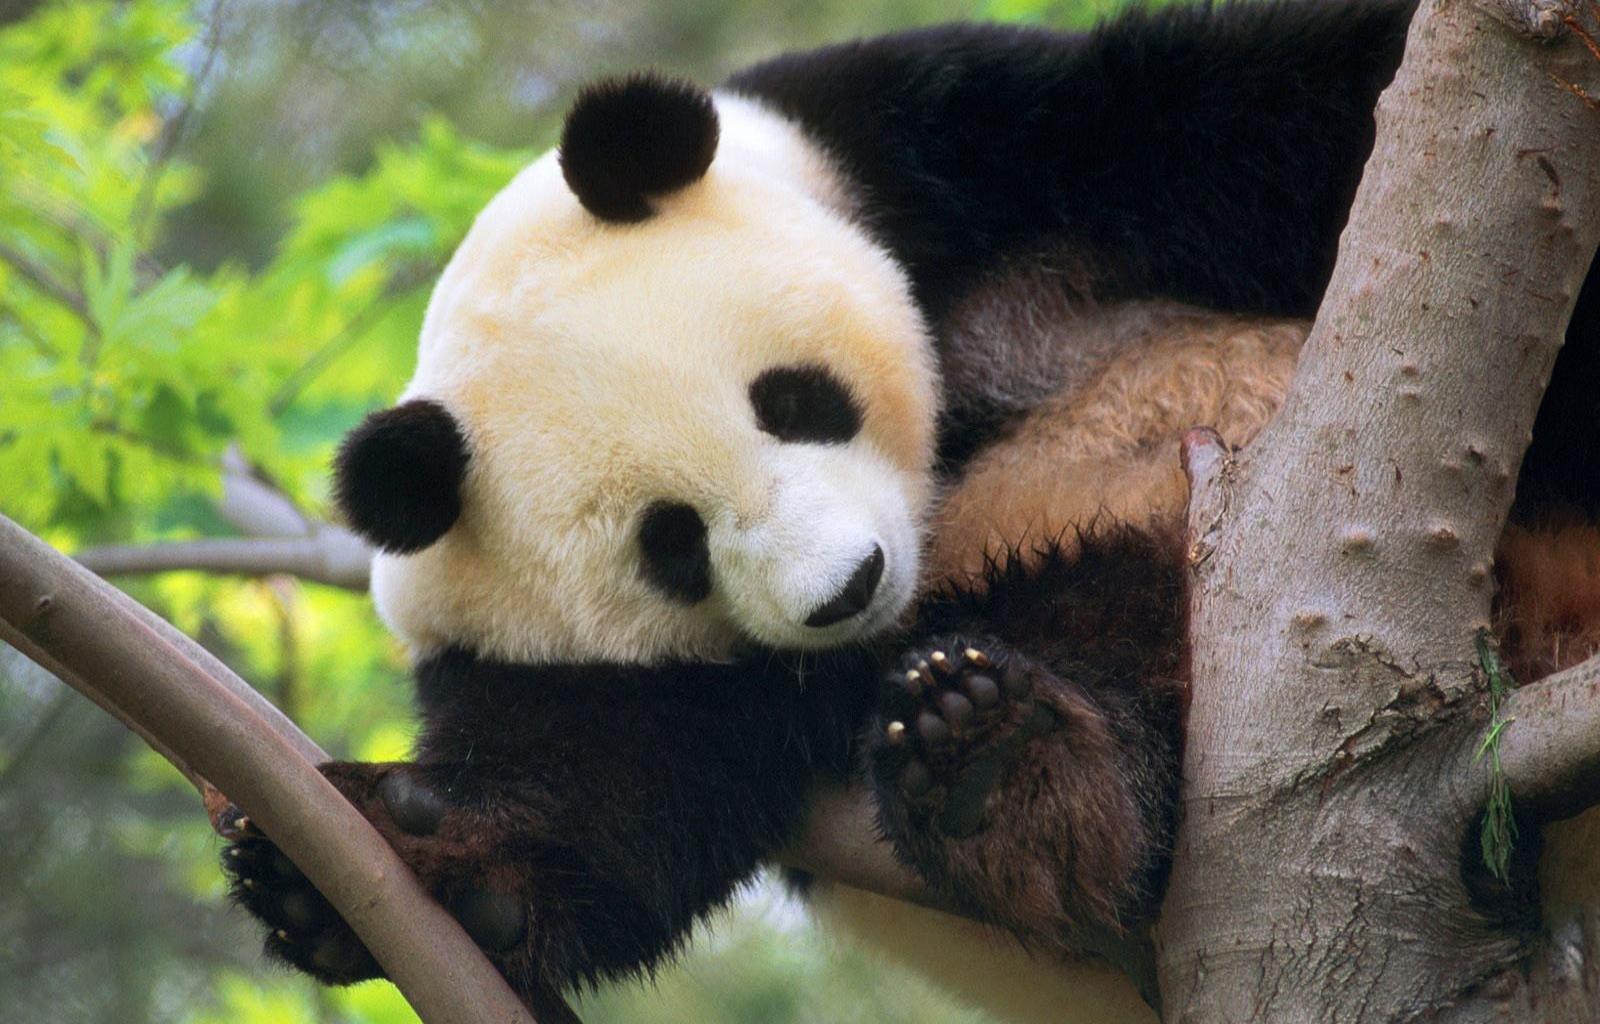 Download Hd 1600x1024 Panda Desktop Wallpaper Id300427 For Free